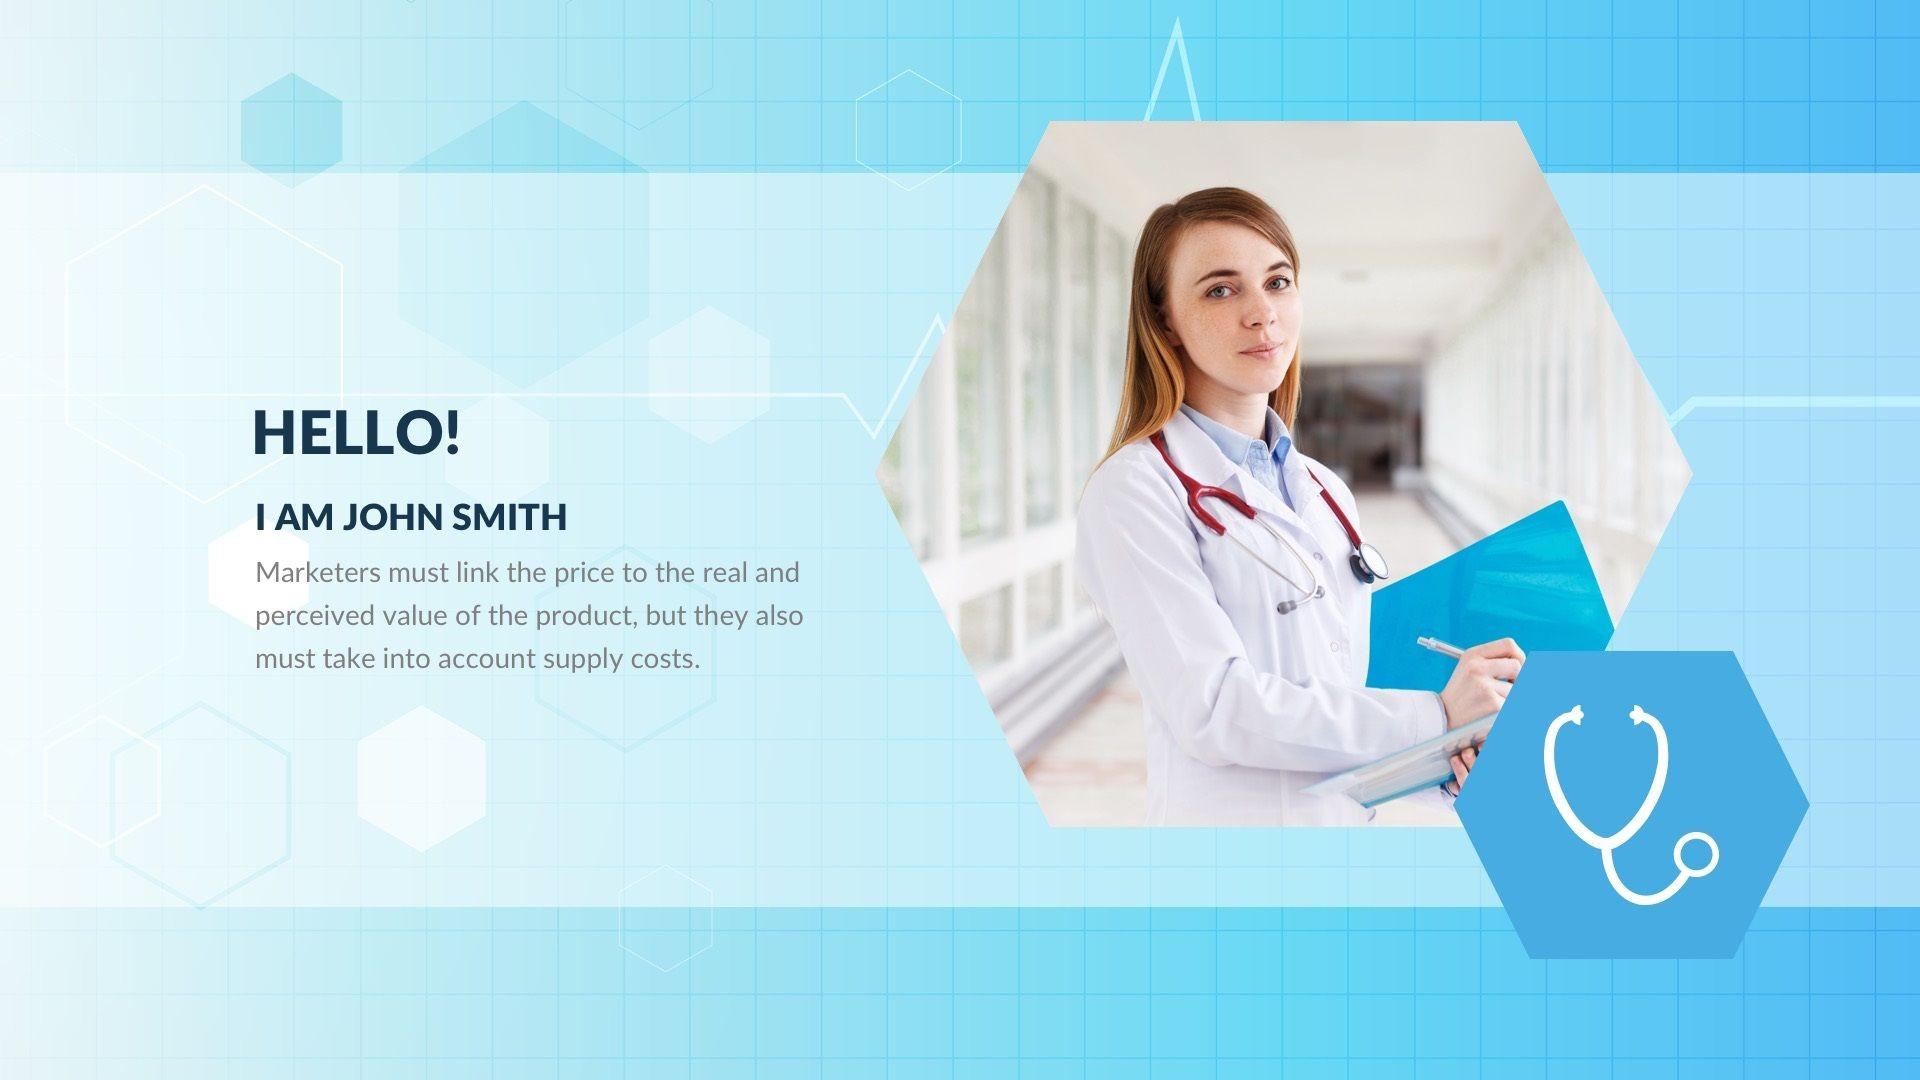 001 Striking Free Nursing Powerpoint Template Highest Clarity  Education Download1920